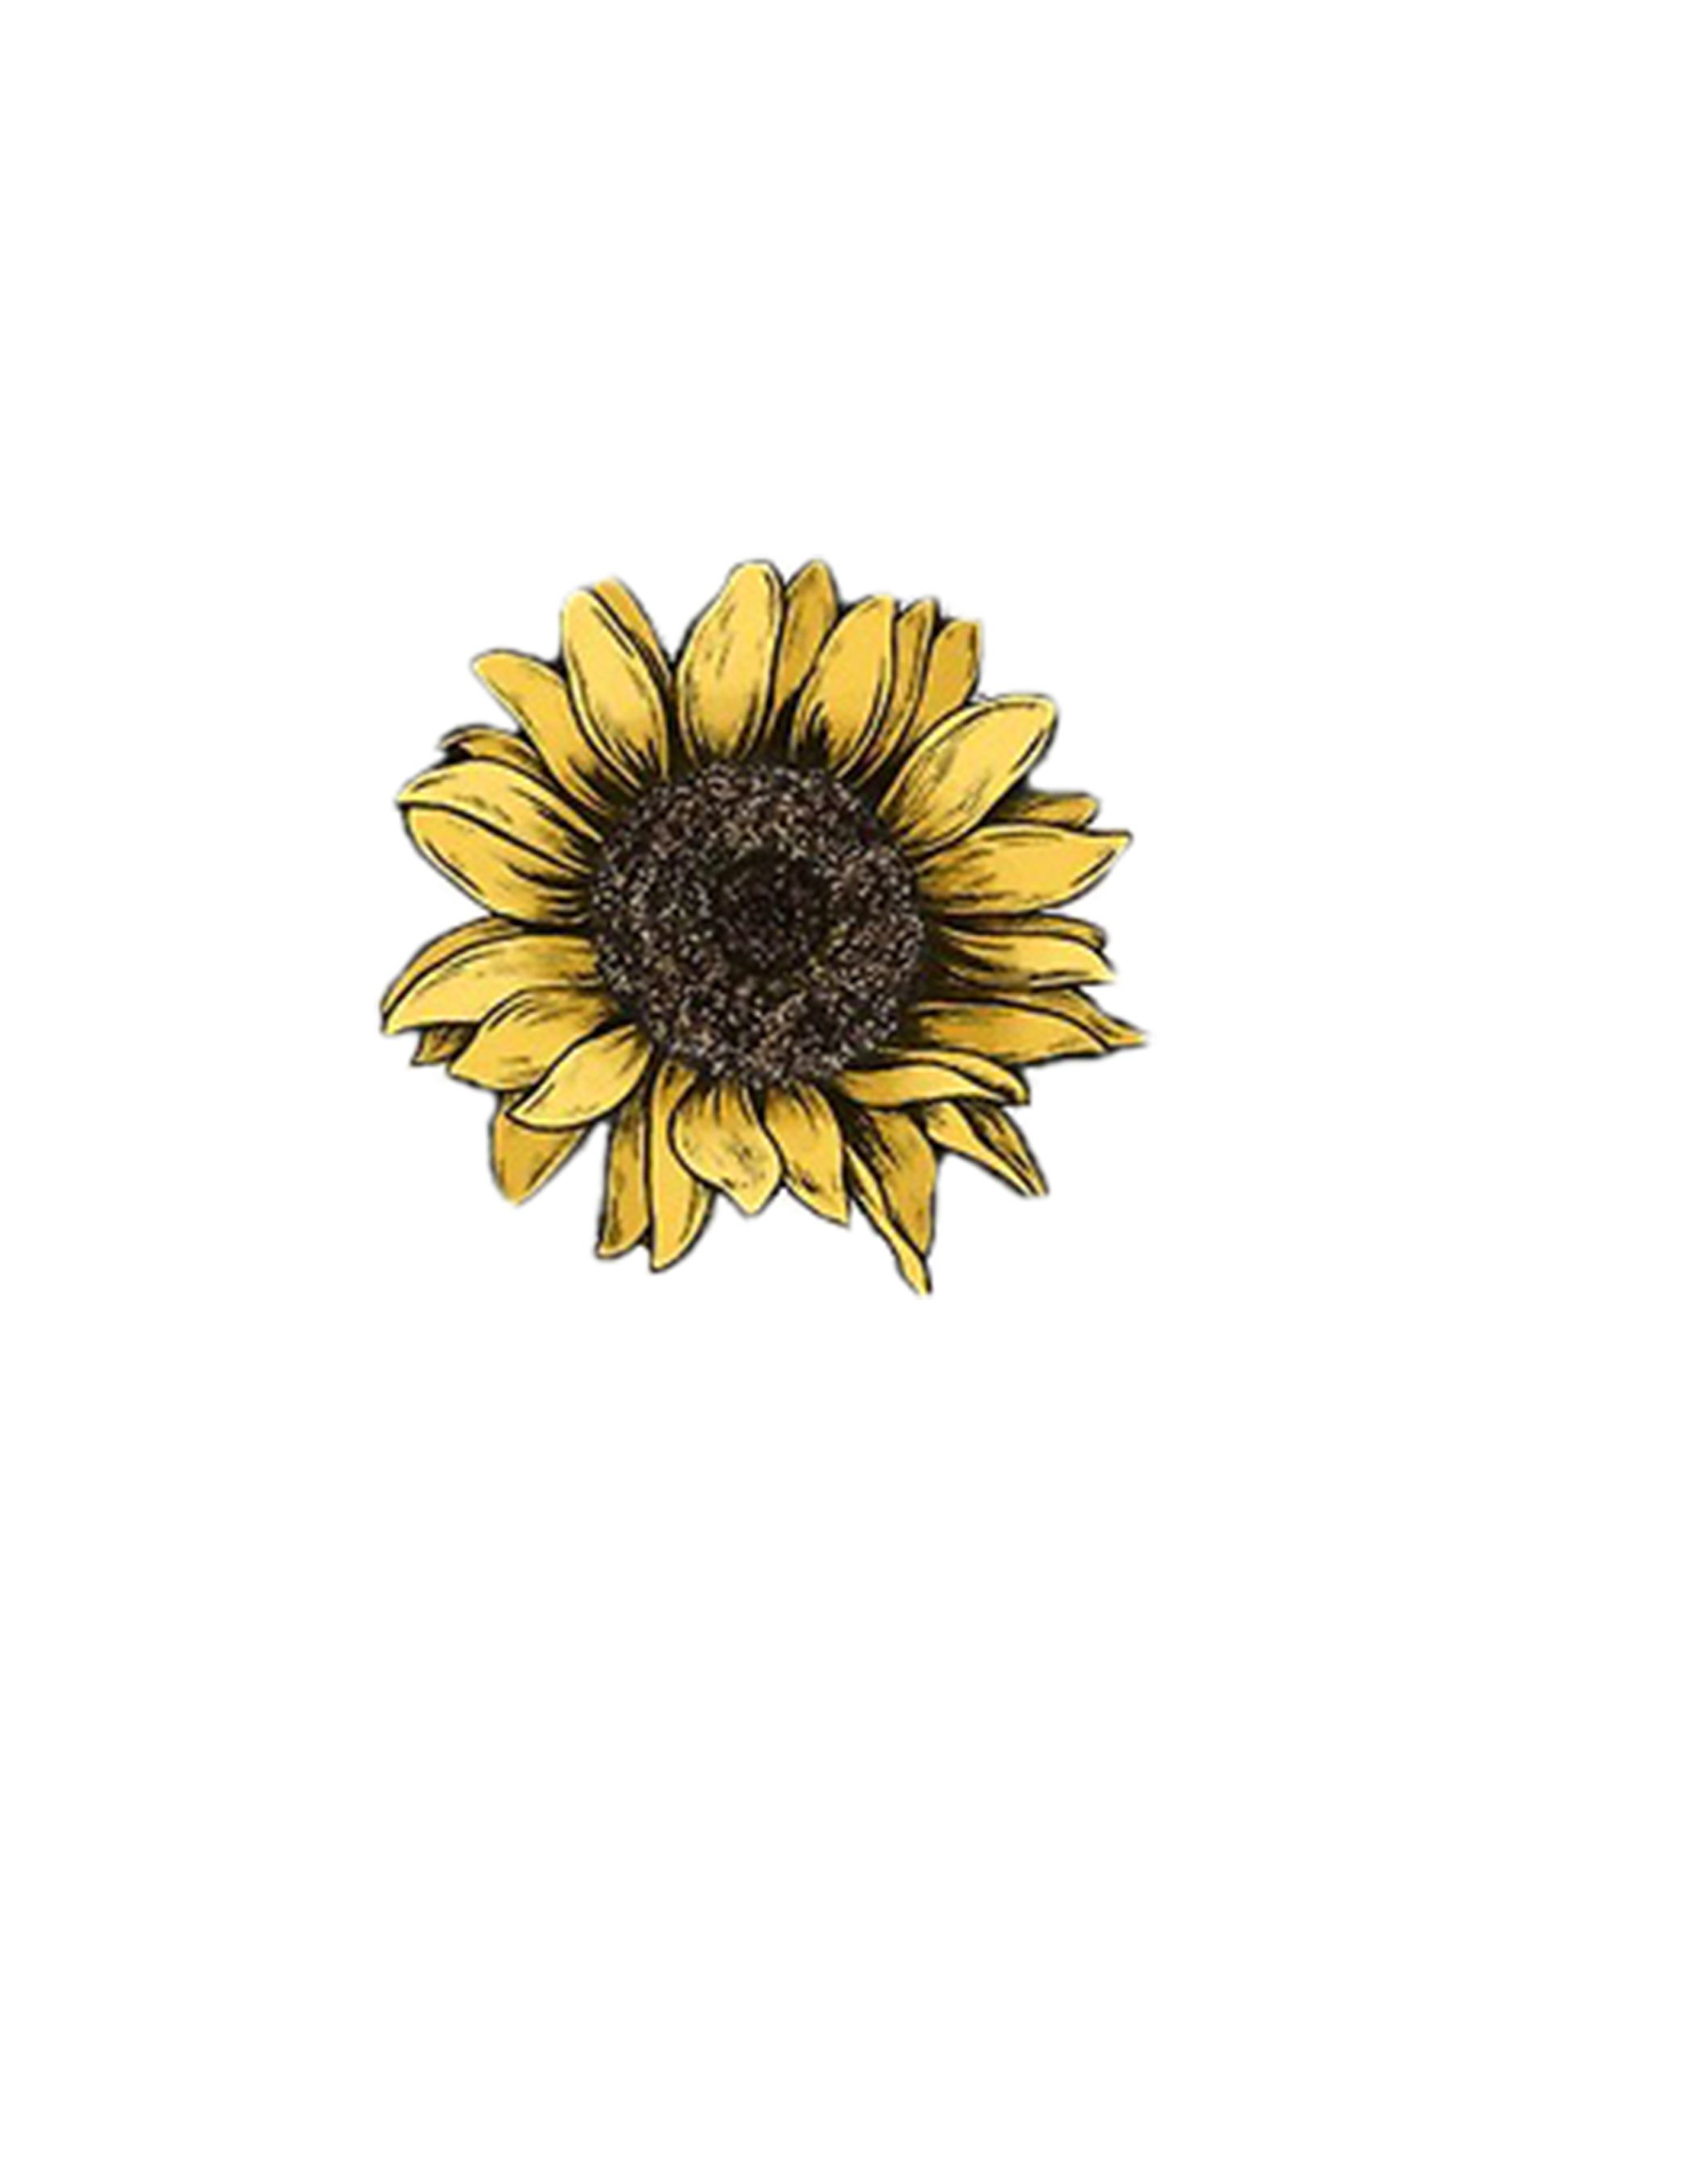 Sunflower Tattoo Art Draw Yellow Flower Sunflower Drawing Sunflower Tattoo Small Tattoo Art Drawings